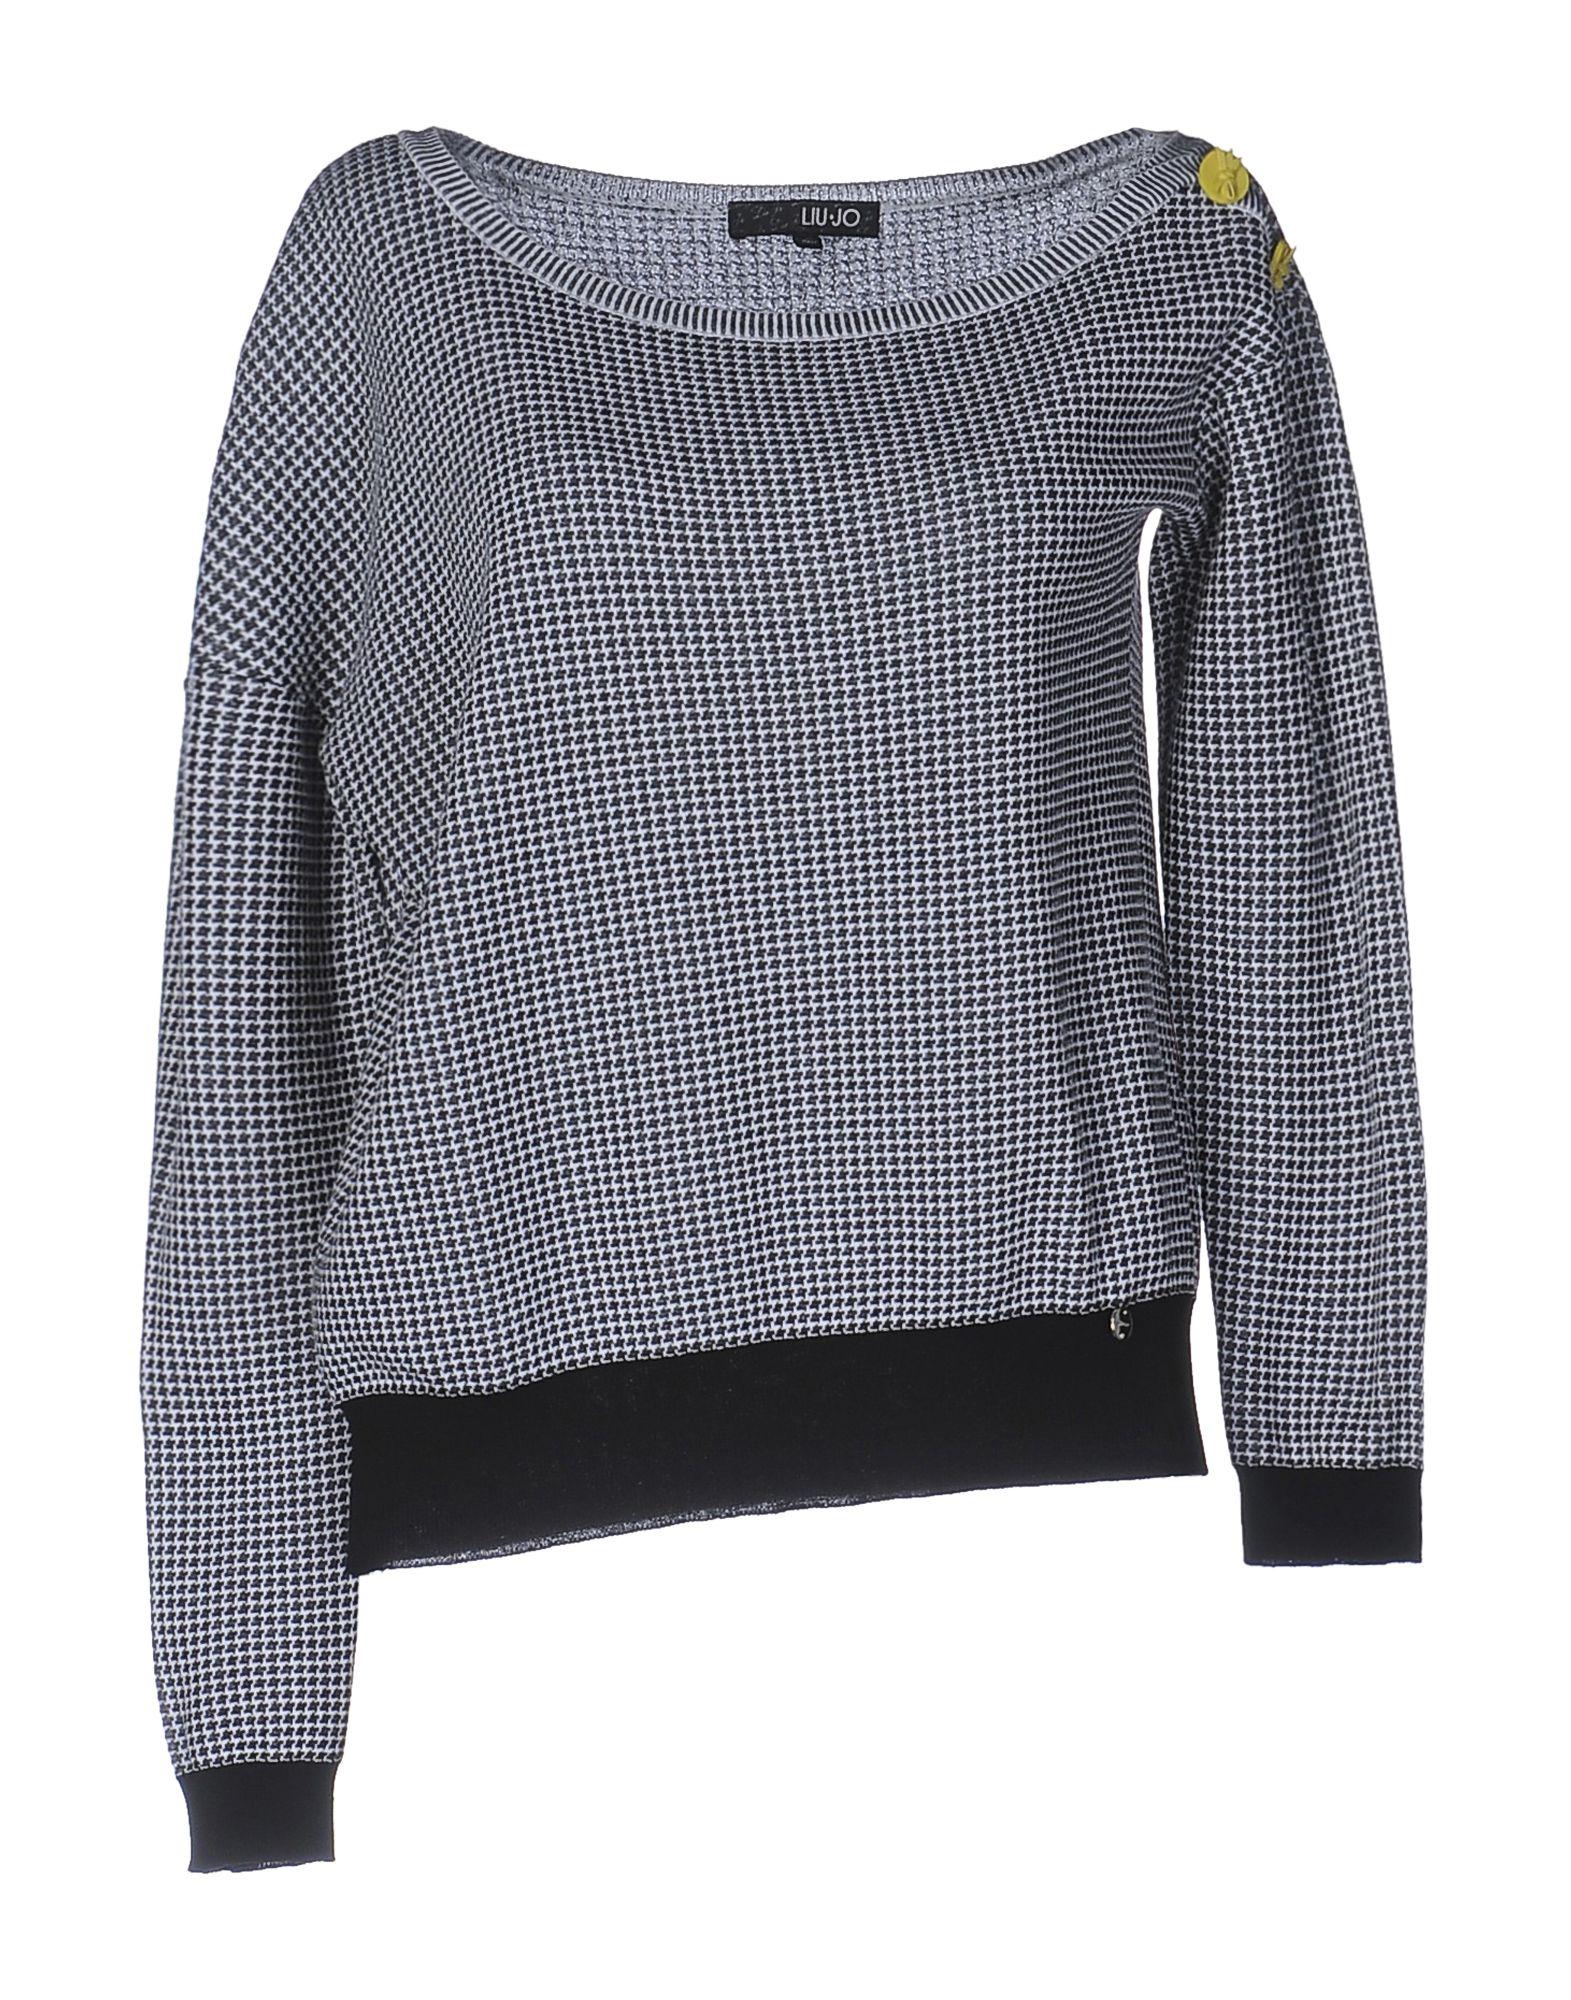 Detectar puerta frecuentemente  LIU JO LIU JO Sweaters from yoox.com   shefinds